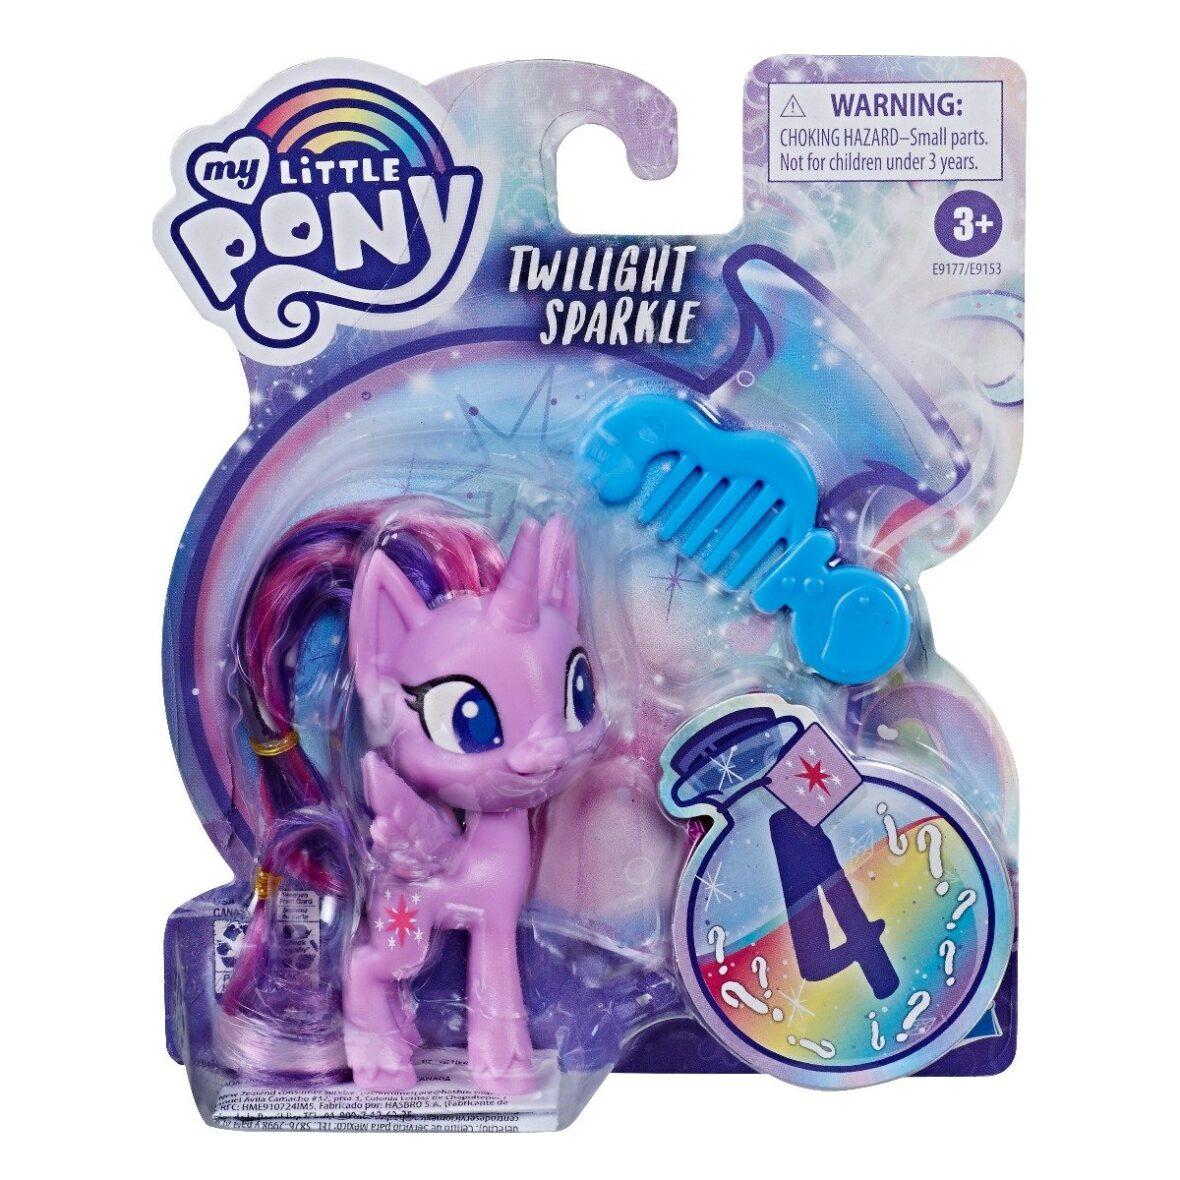 My Little Pony Ponei Seria Potion Twilight Sparkle